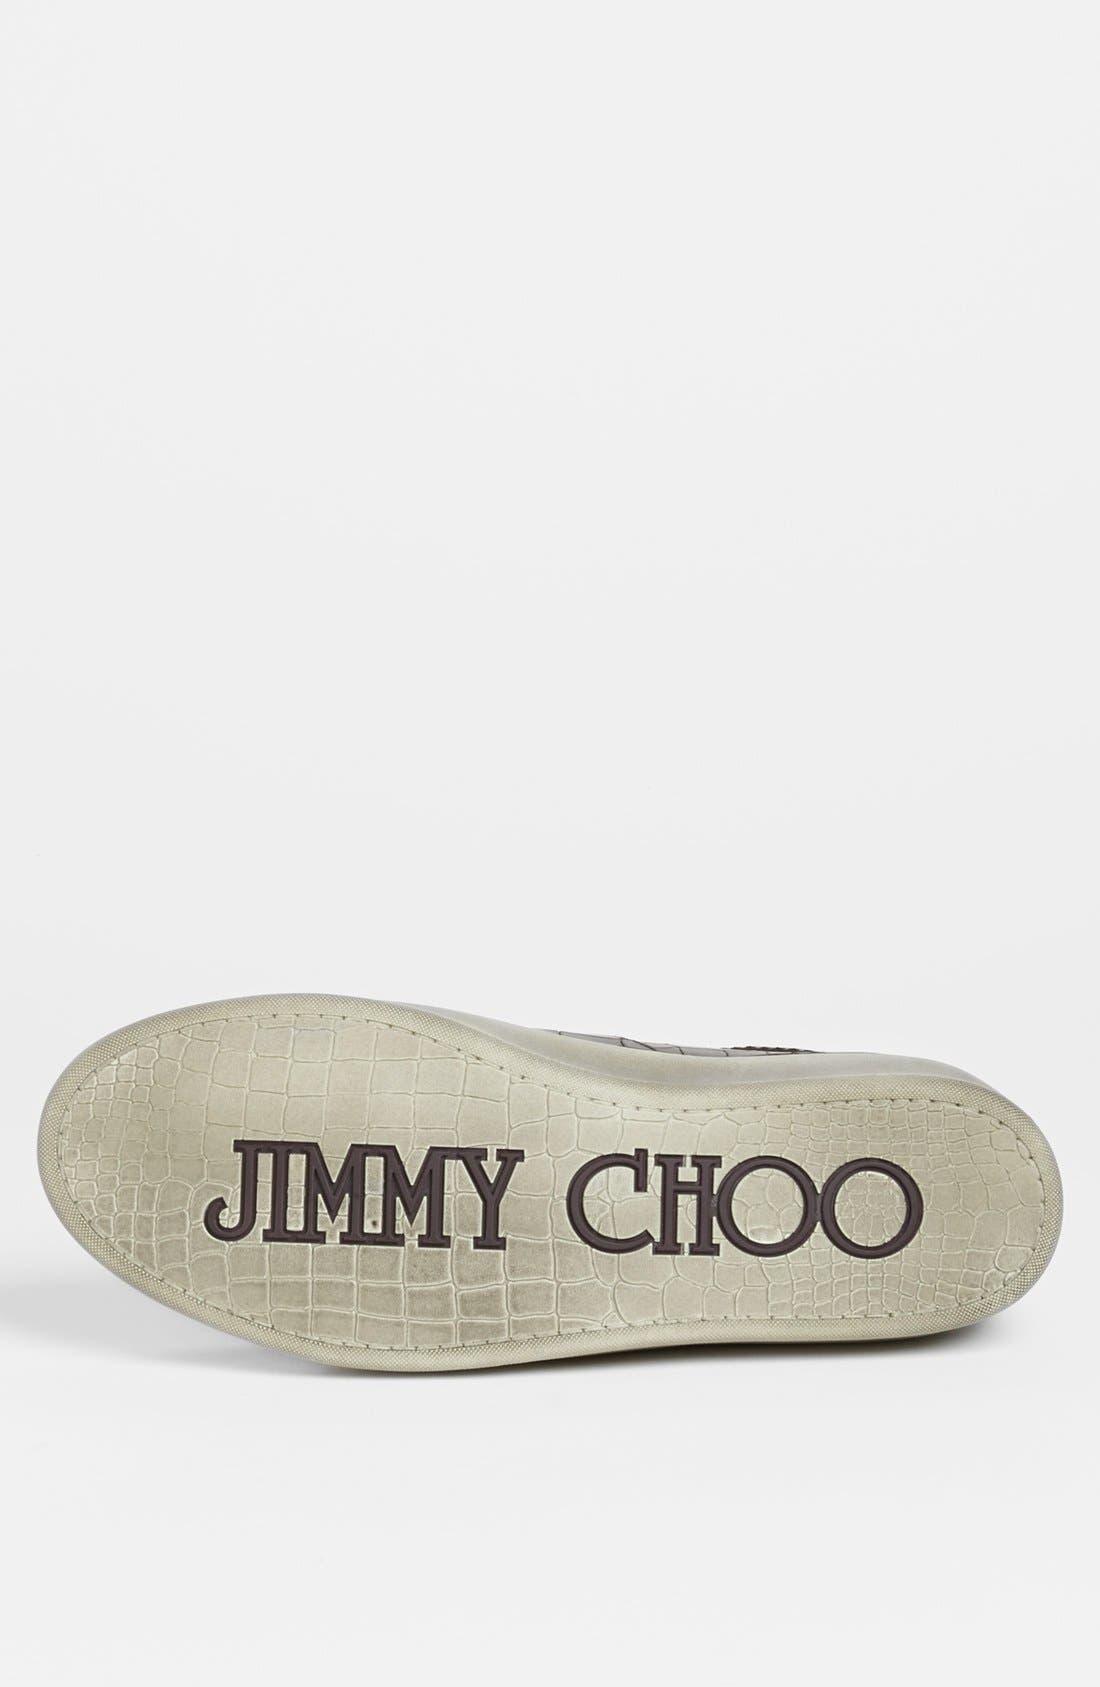 JIMMY CHOO,                             'Portman' Sneaker,                             Alternate thumbnail 3, color,                             001